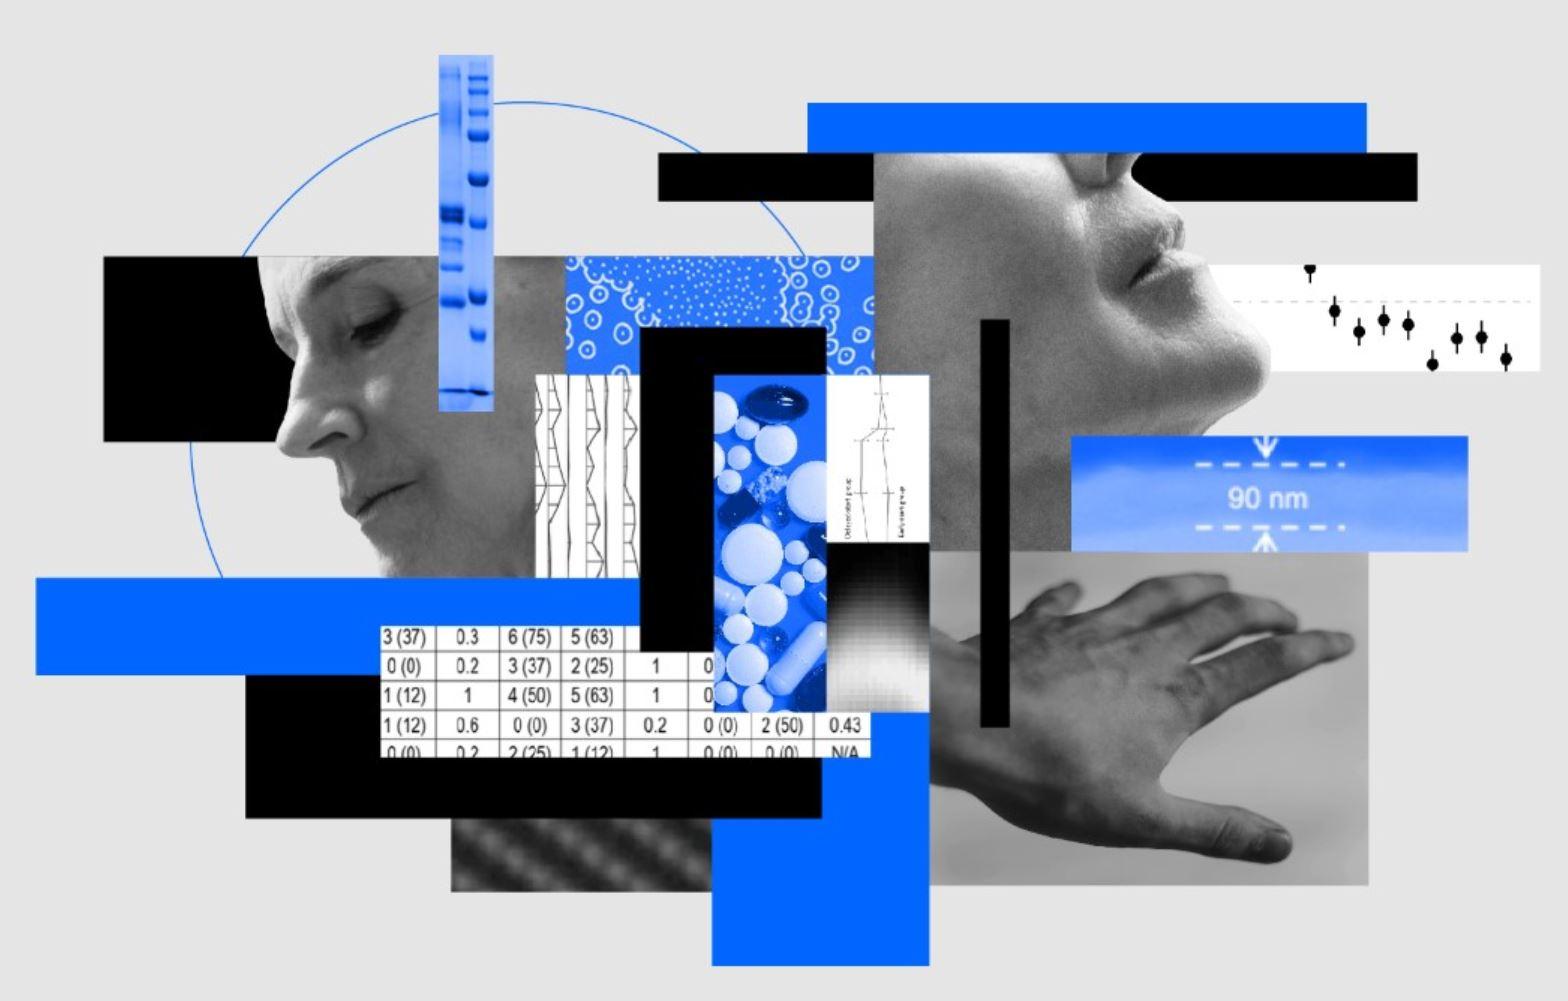 intelligenza artificiale Parkinson